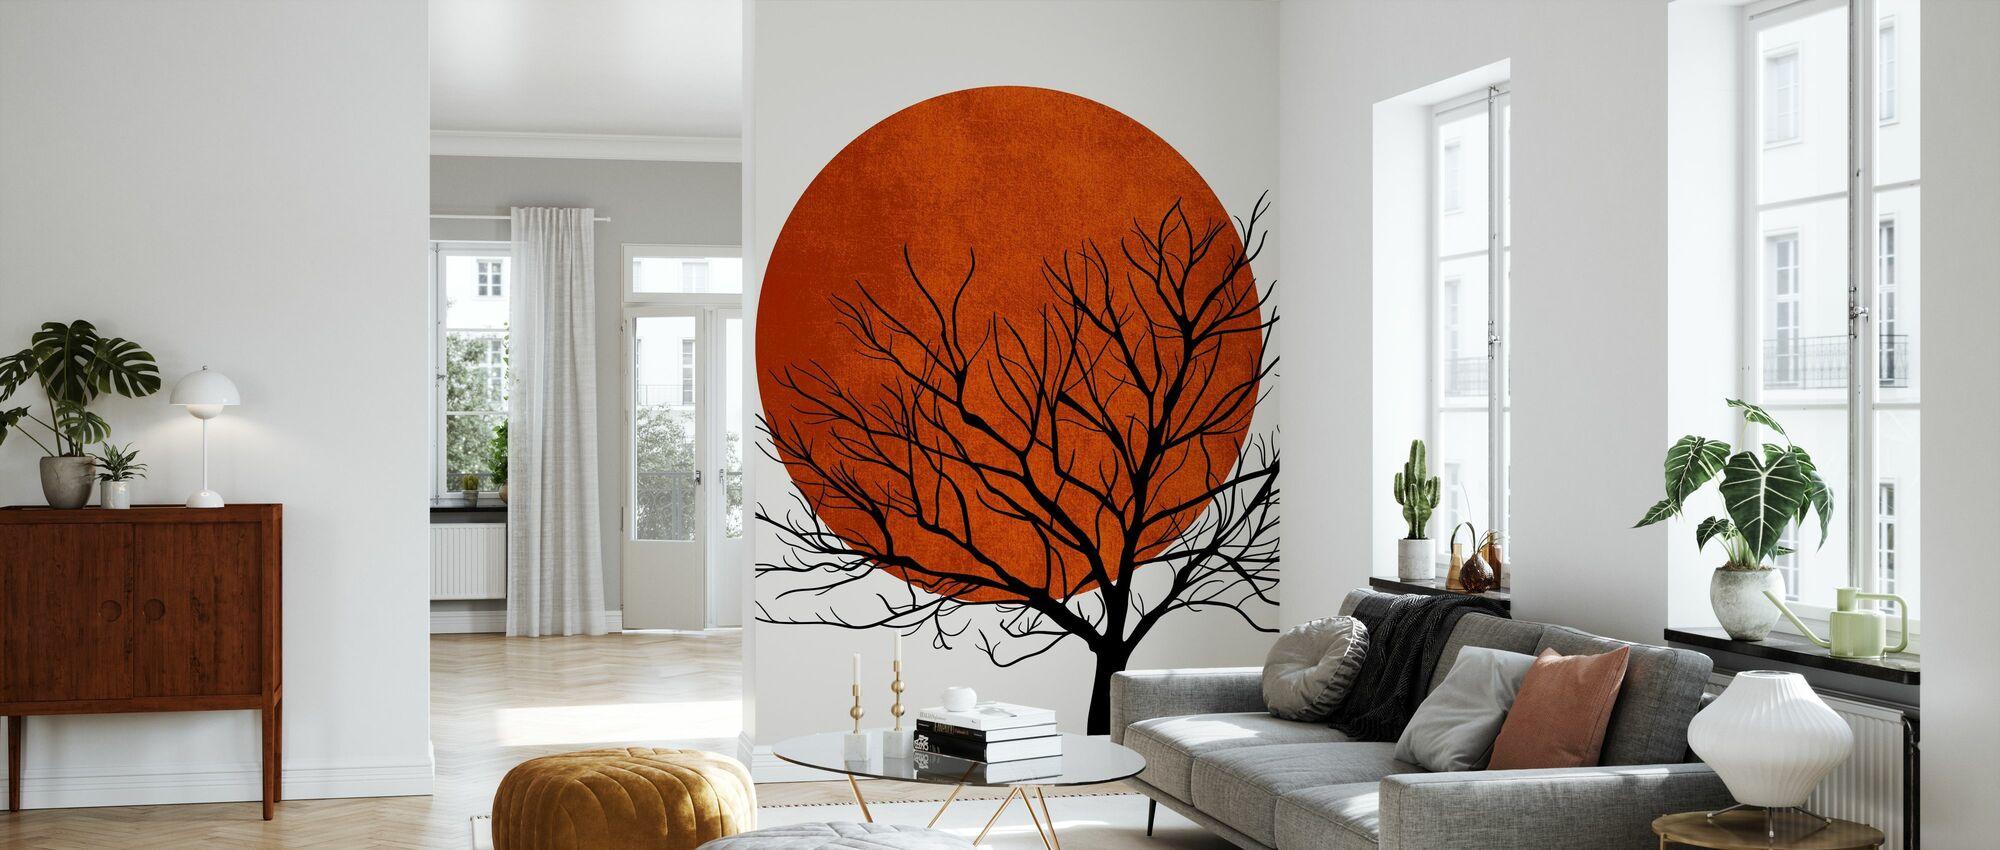 Warm Winter - Wallpaper - Living Room